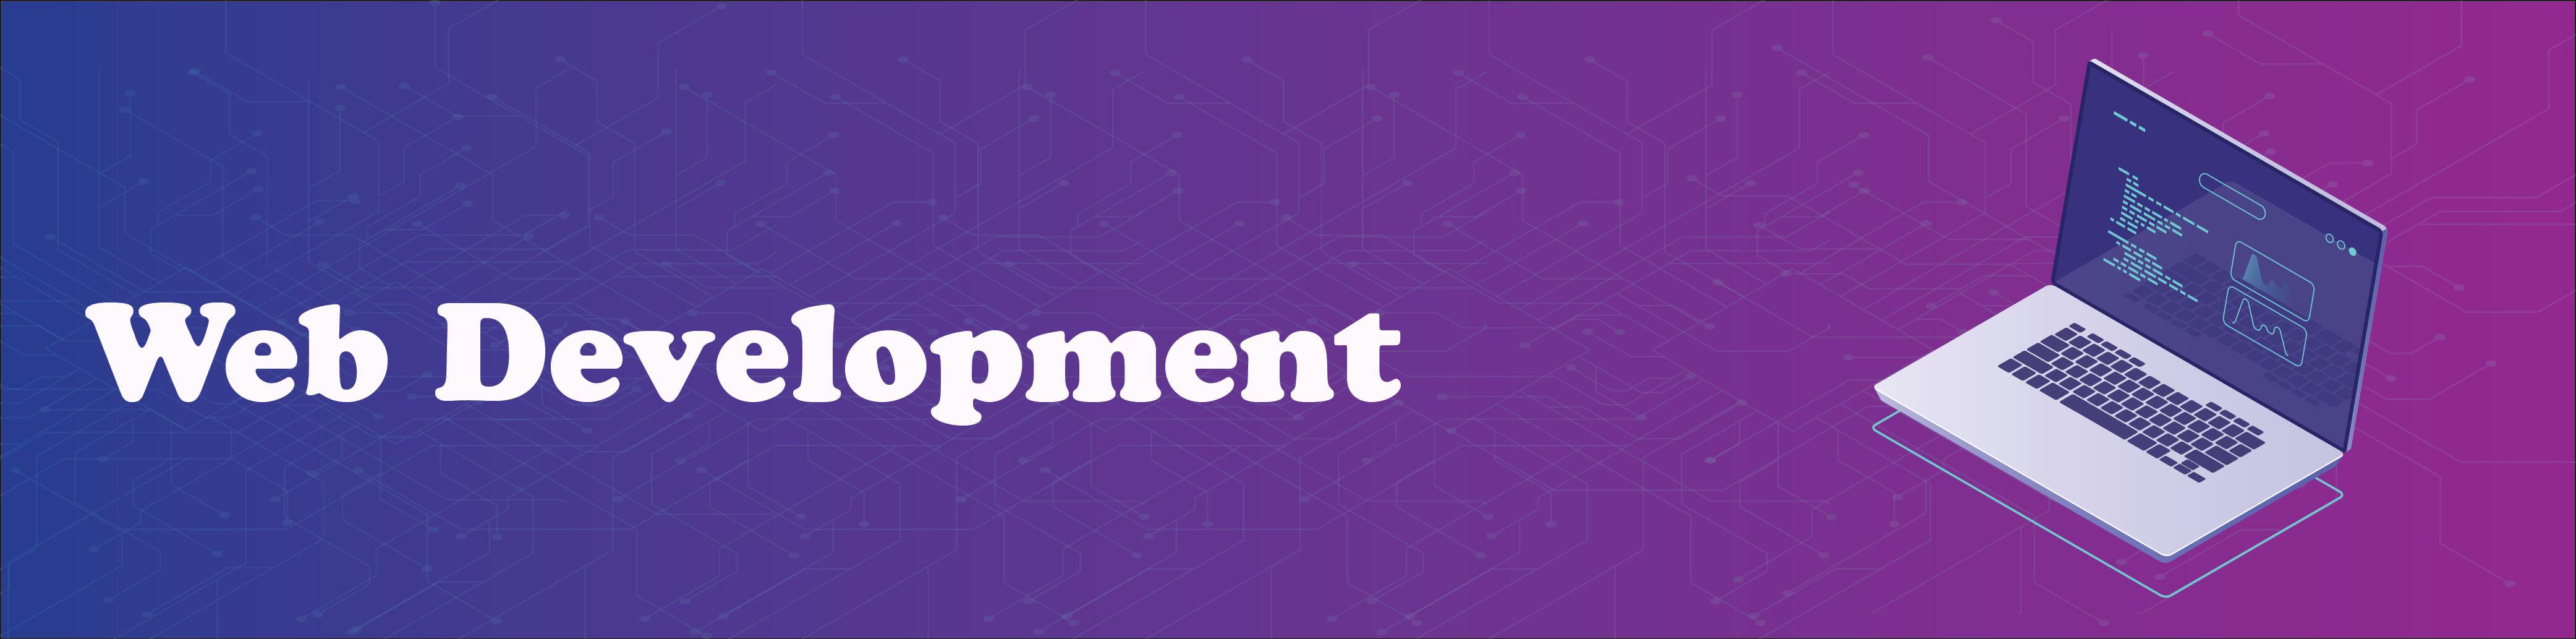 web development training courses information